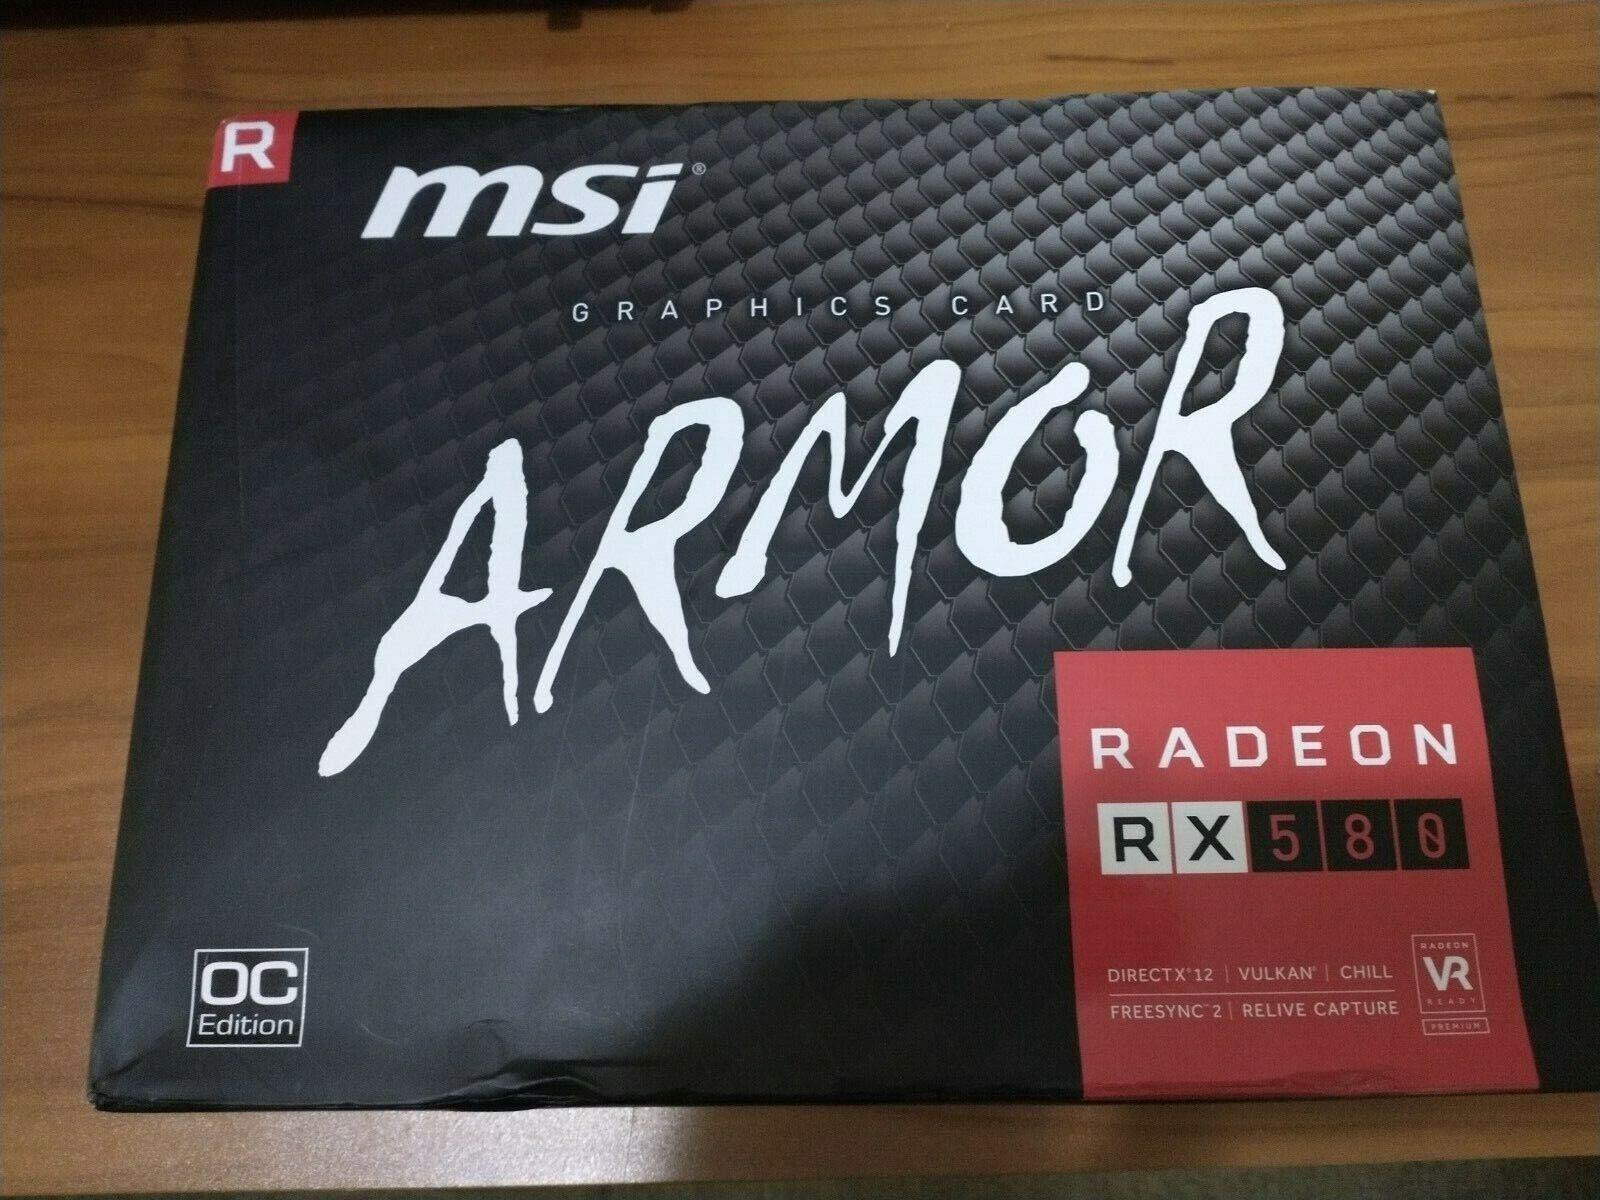 NEW MSI AMD Radeon RX 580 4GB GPU VRAM Graphics Card PC Gaming